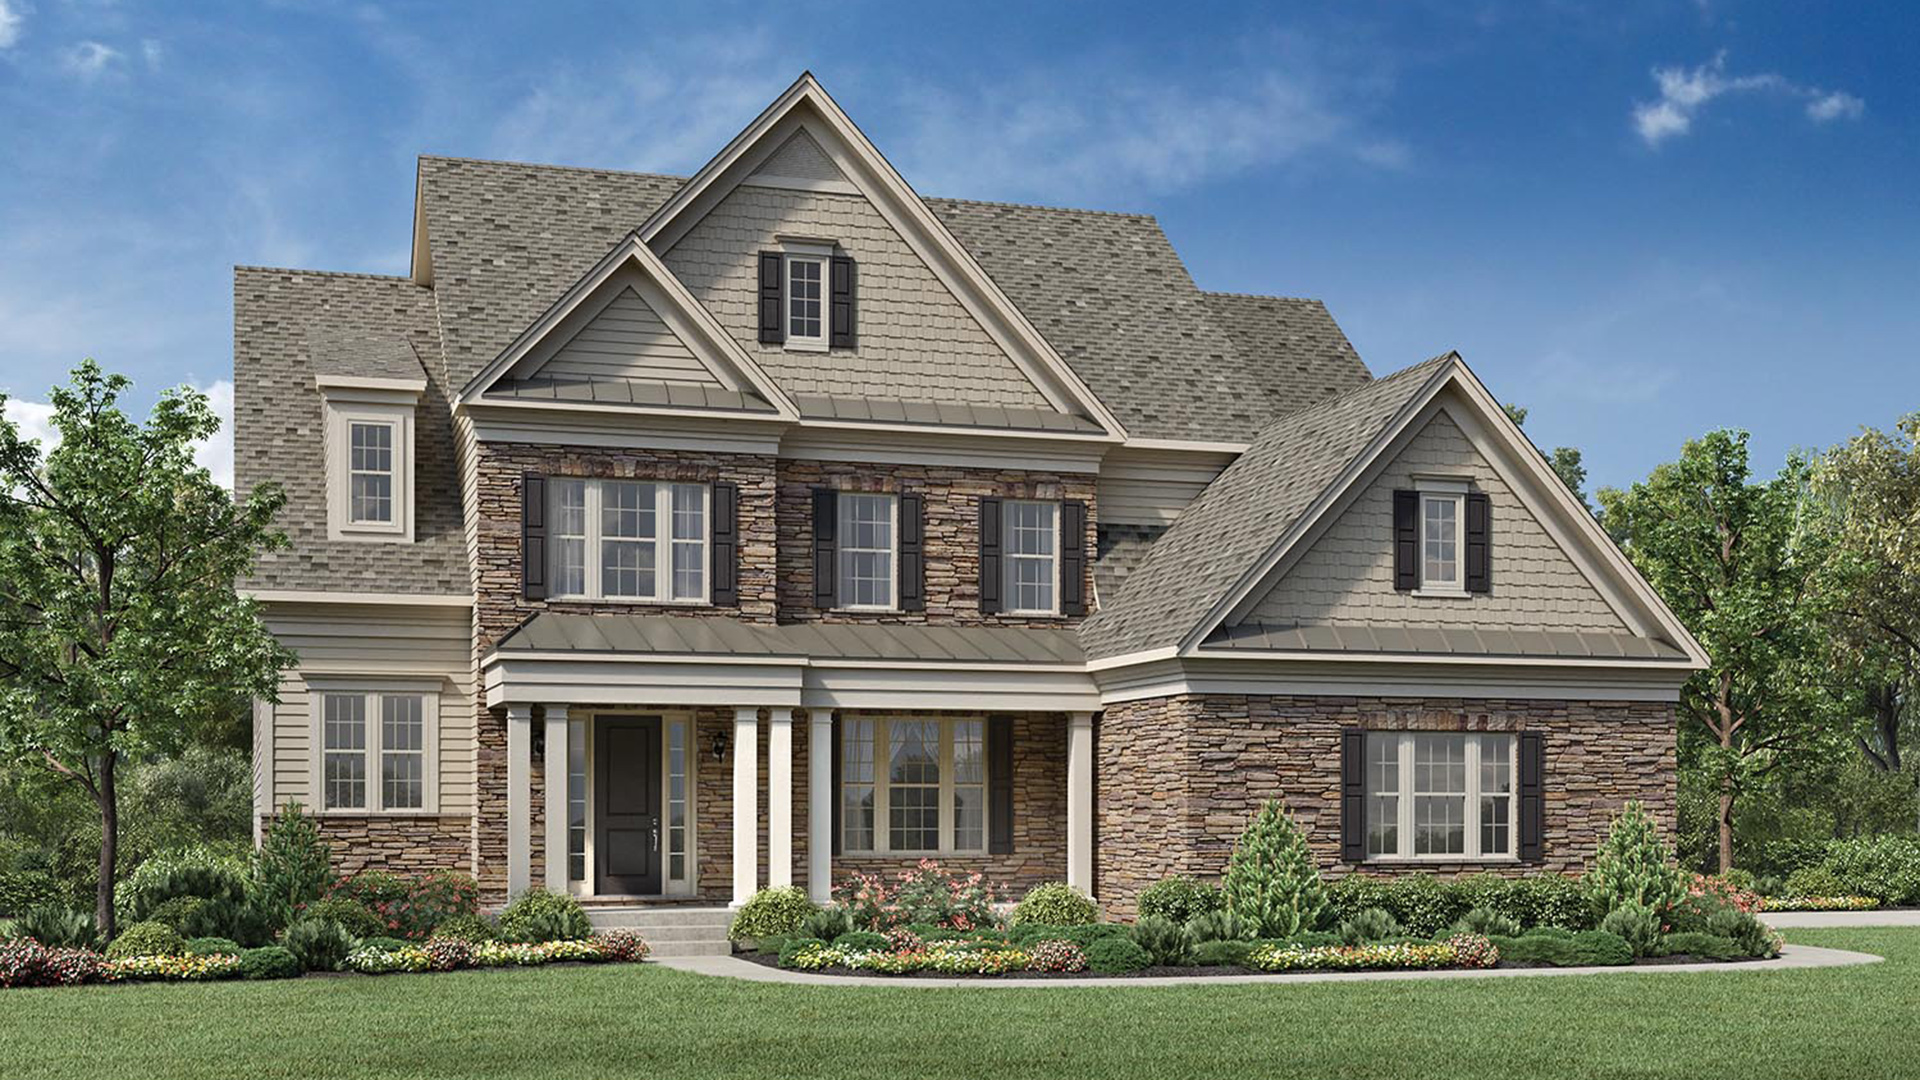 Weddington Nc New Construction Homes